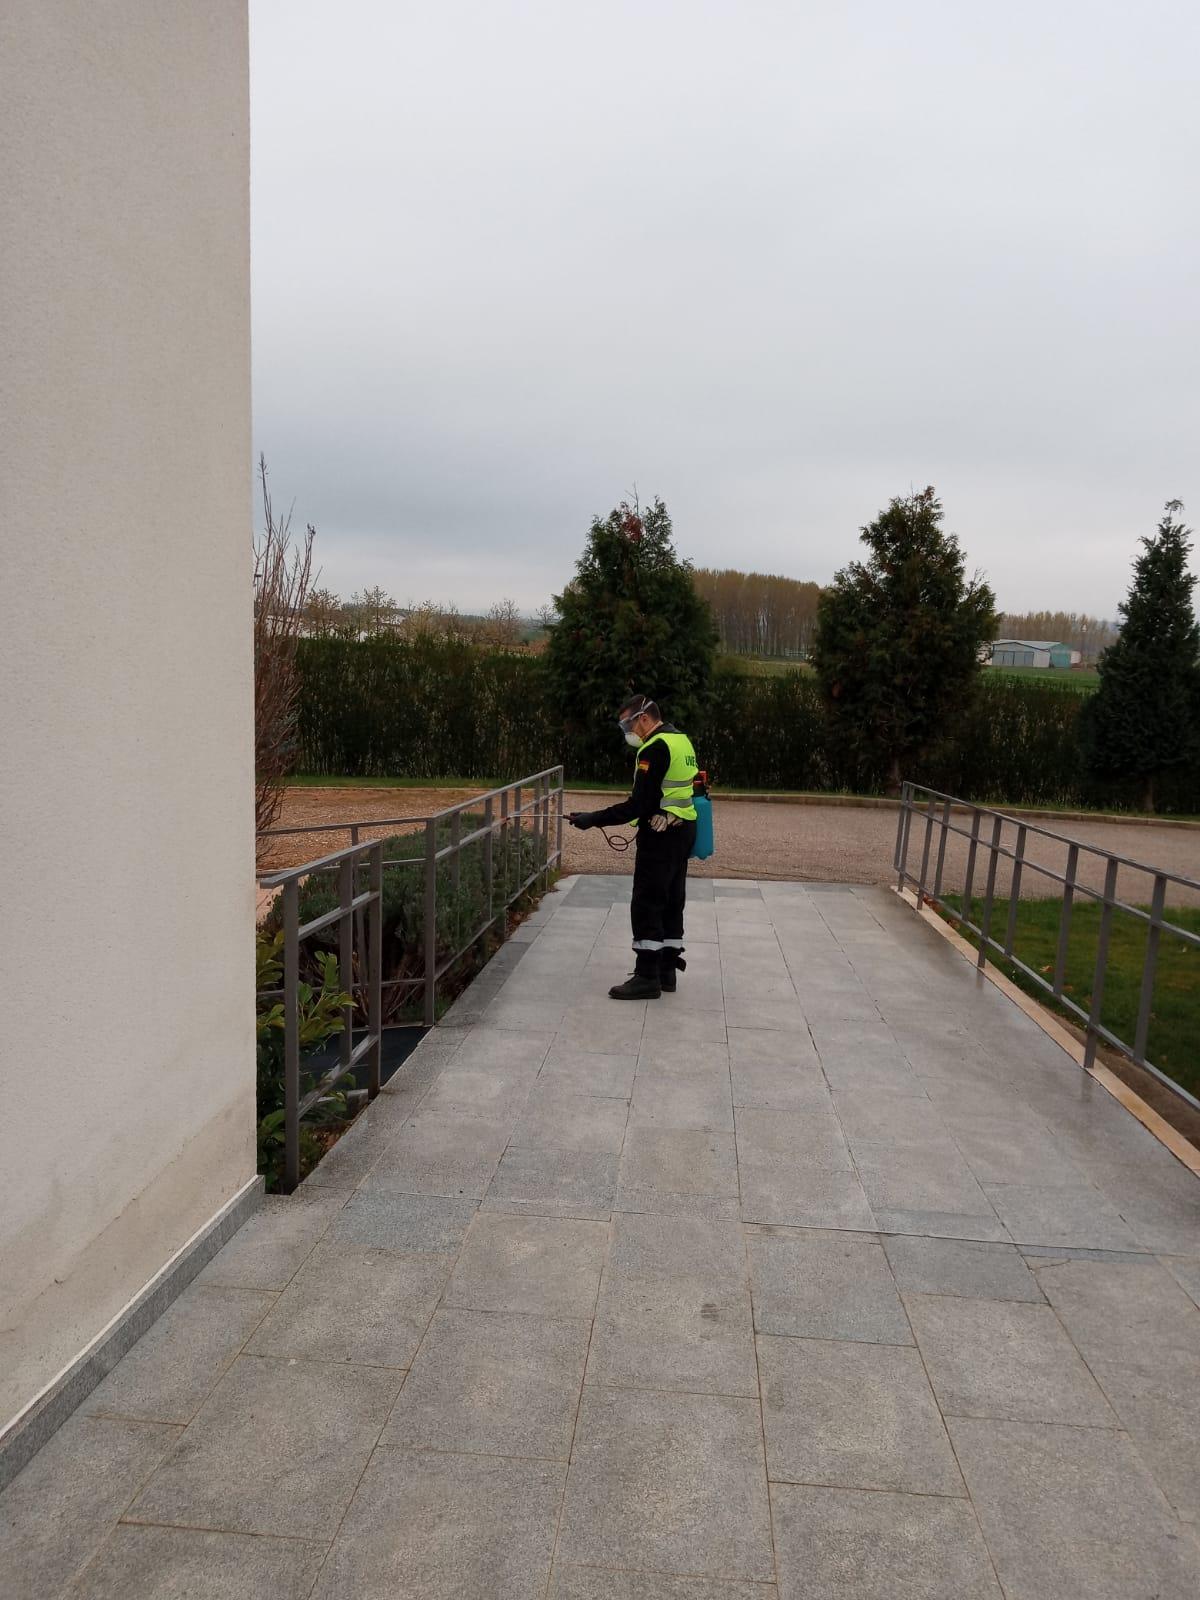 VÍDEO| Así continua la UME desinfectando residencias en León